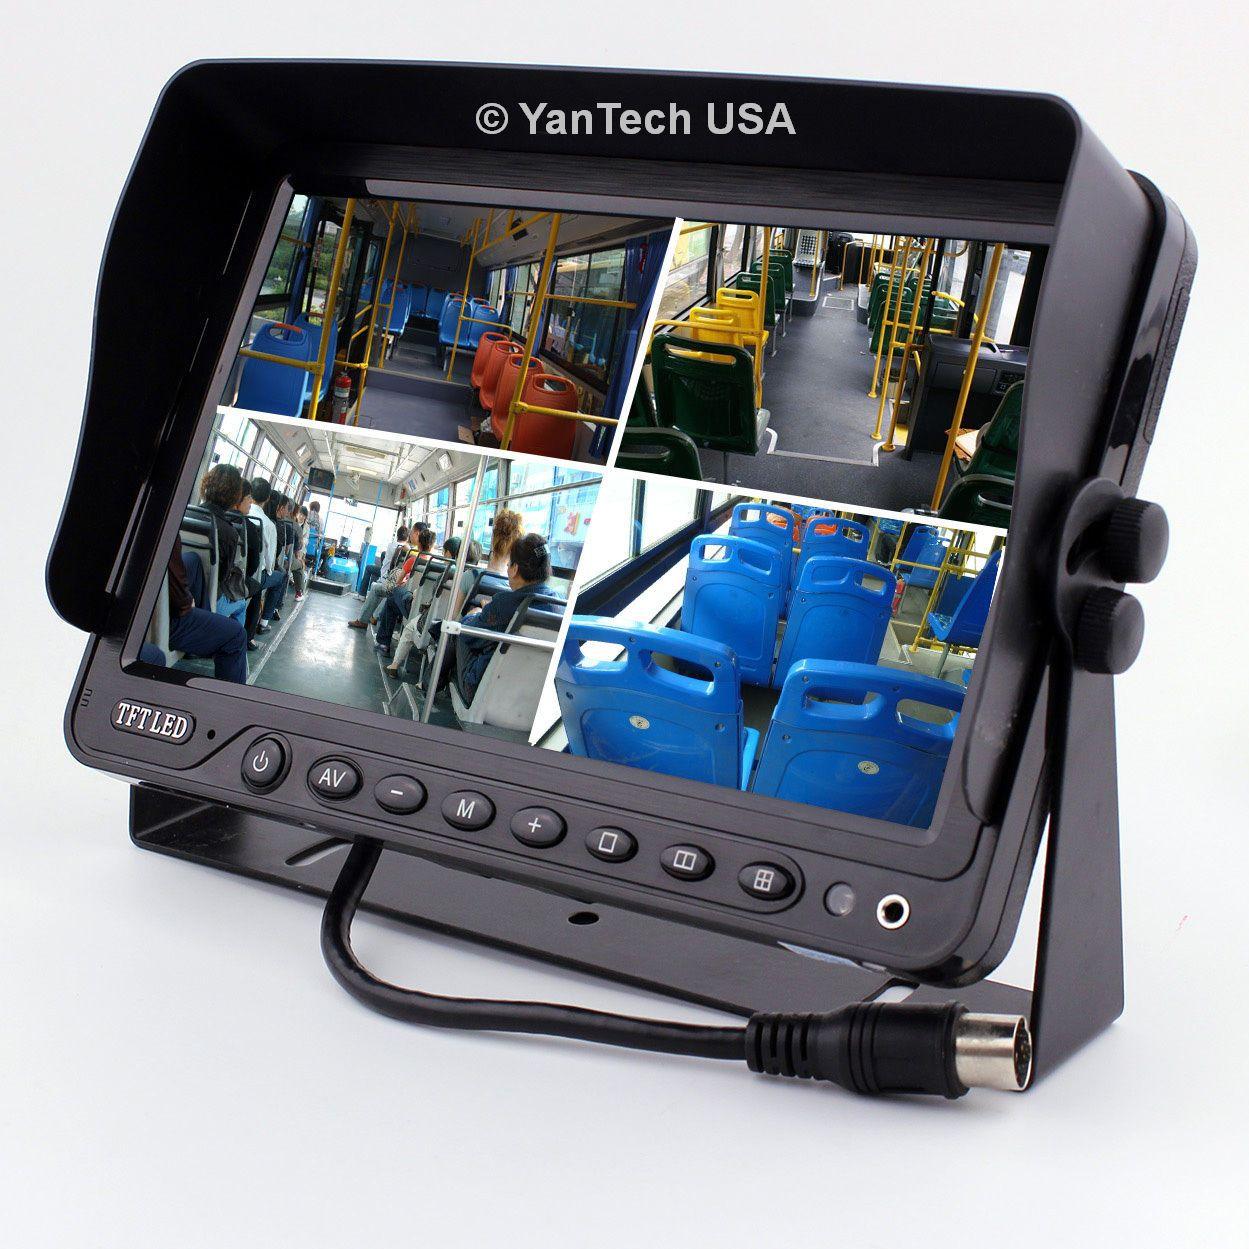 http://yantechusa.com/images/source/eBay2013/HY723SDVR_Front1_YanTech.jpg